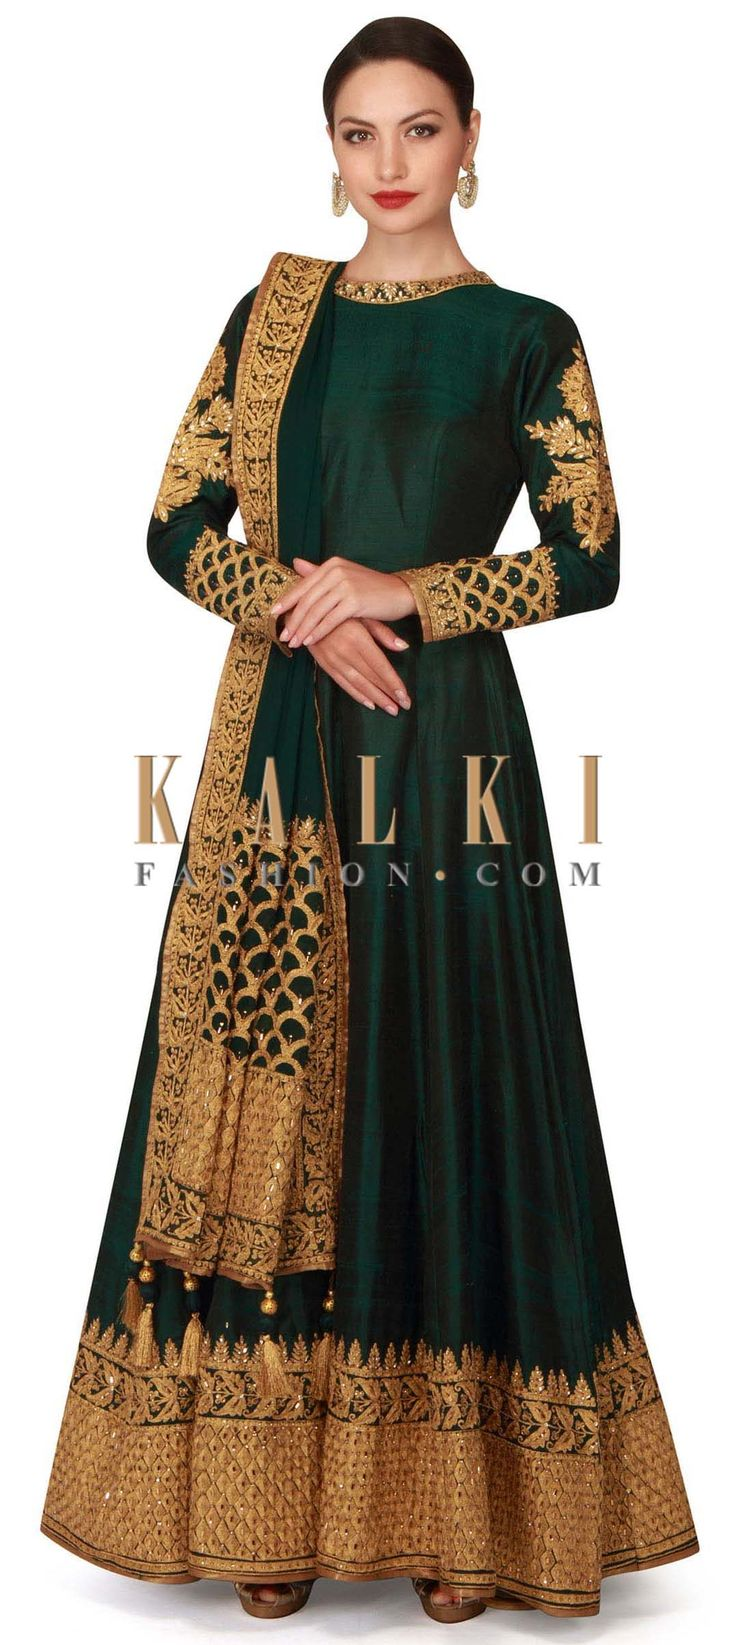 Buy now Dark green anarkali suit with embroidered hem line only on Kalki